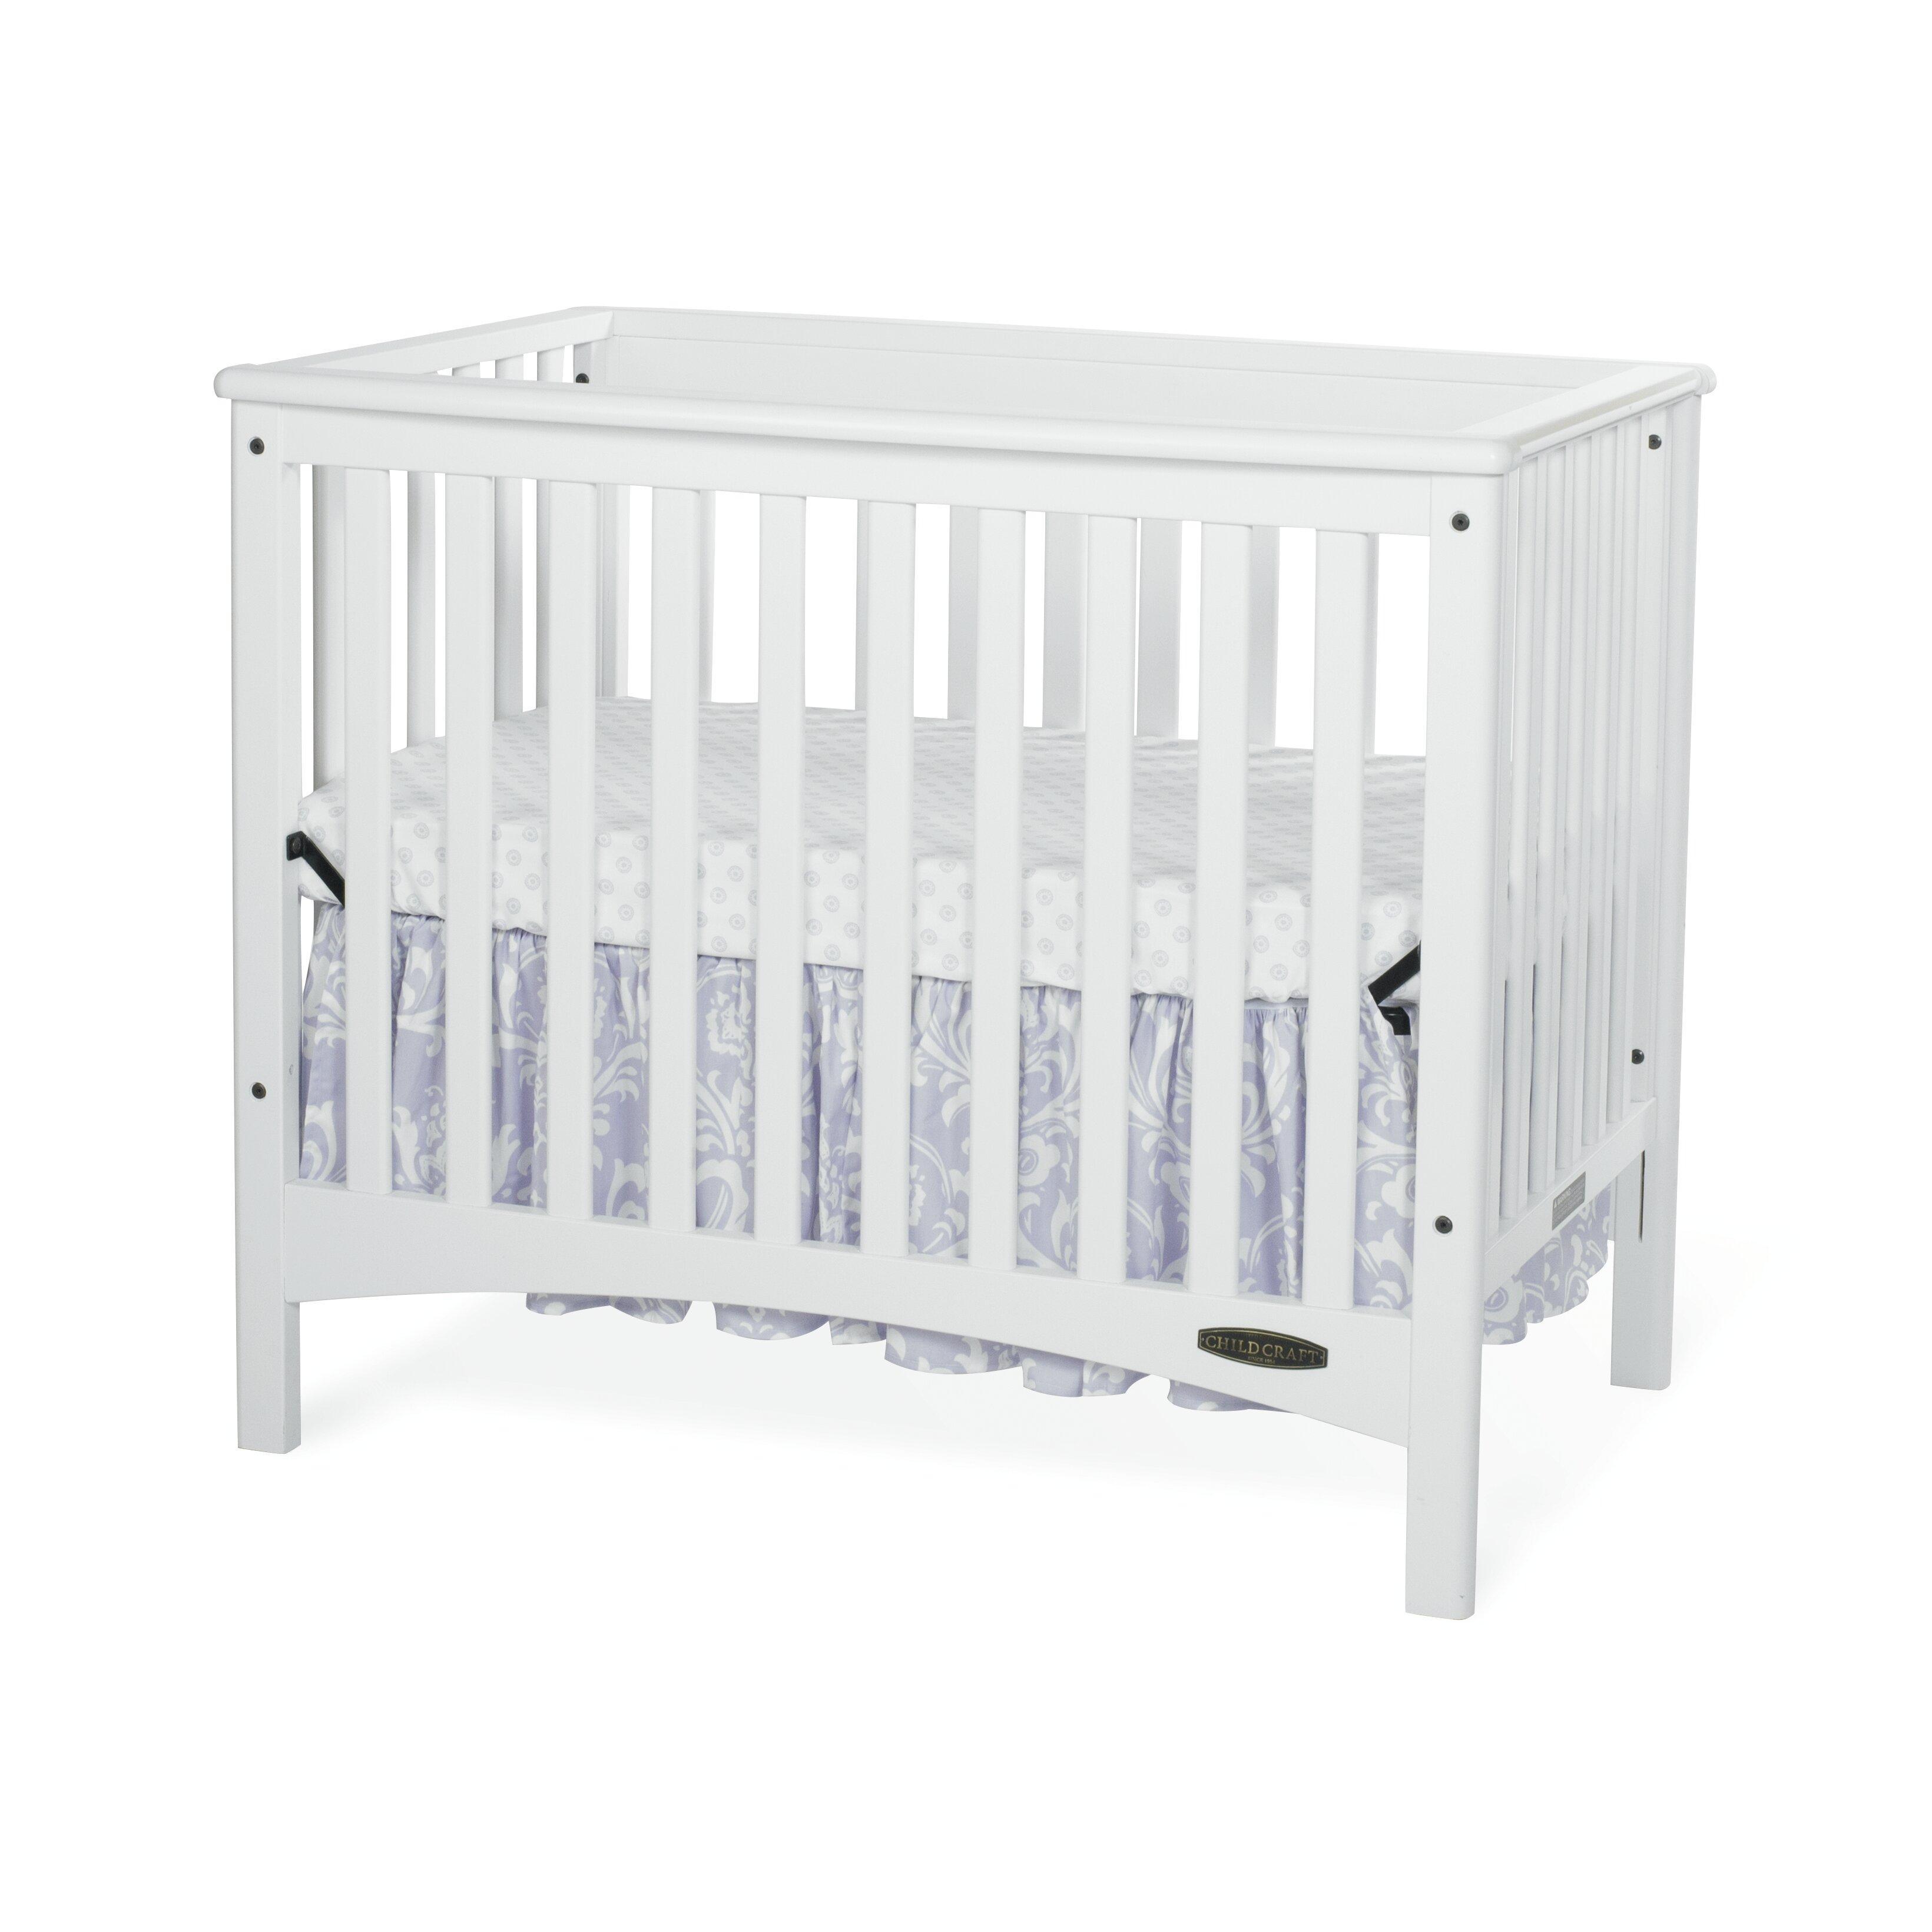 Evacuation crib for sale - Child Craft London Euro Mini Convertible Crib With Mattress